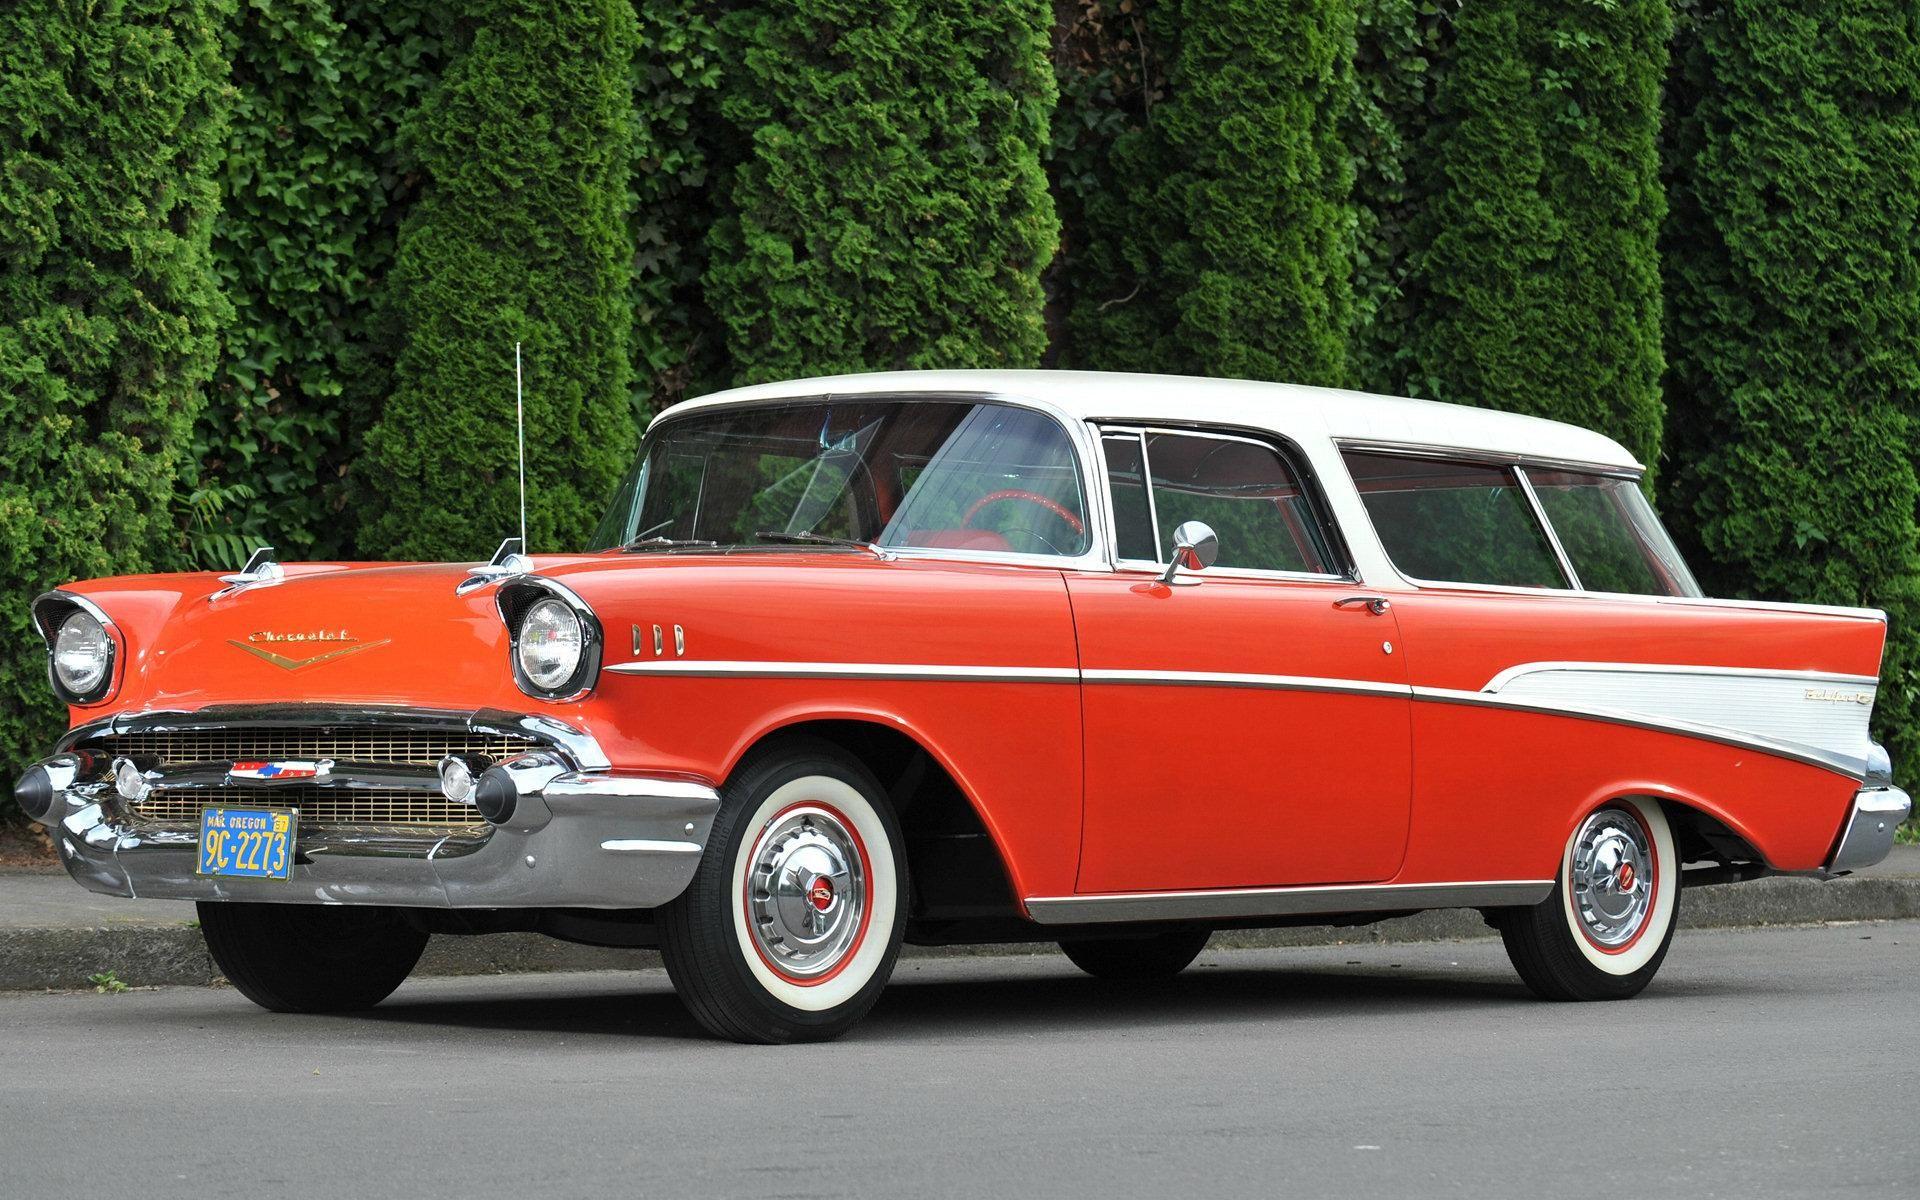 1957 Chevy Bel Air Orange Hd Chevrolet Bel Air Nomad 1957